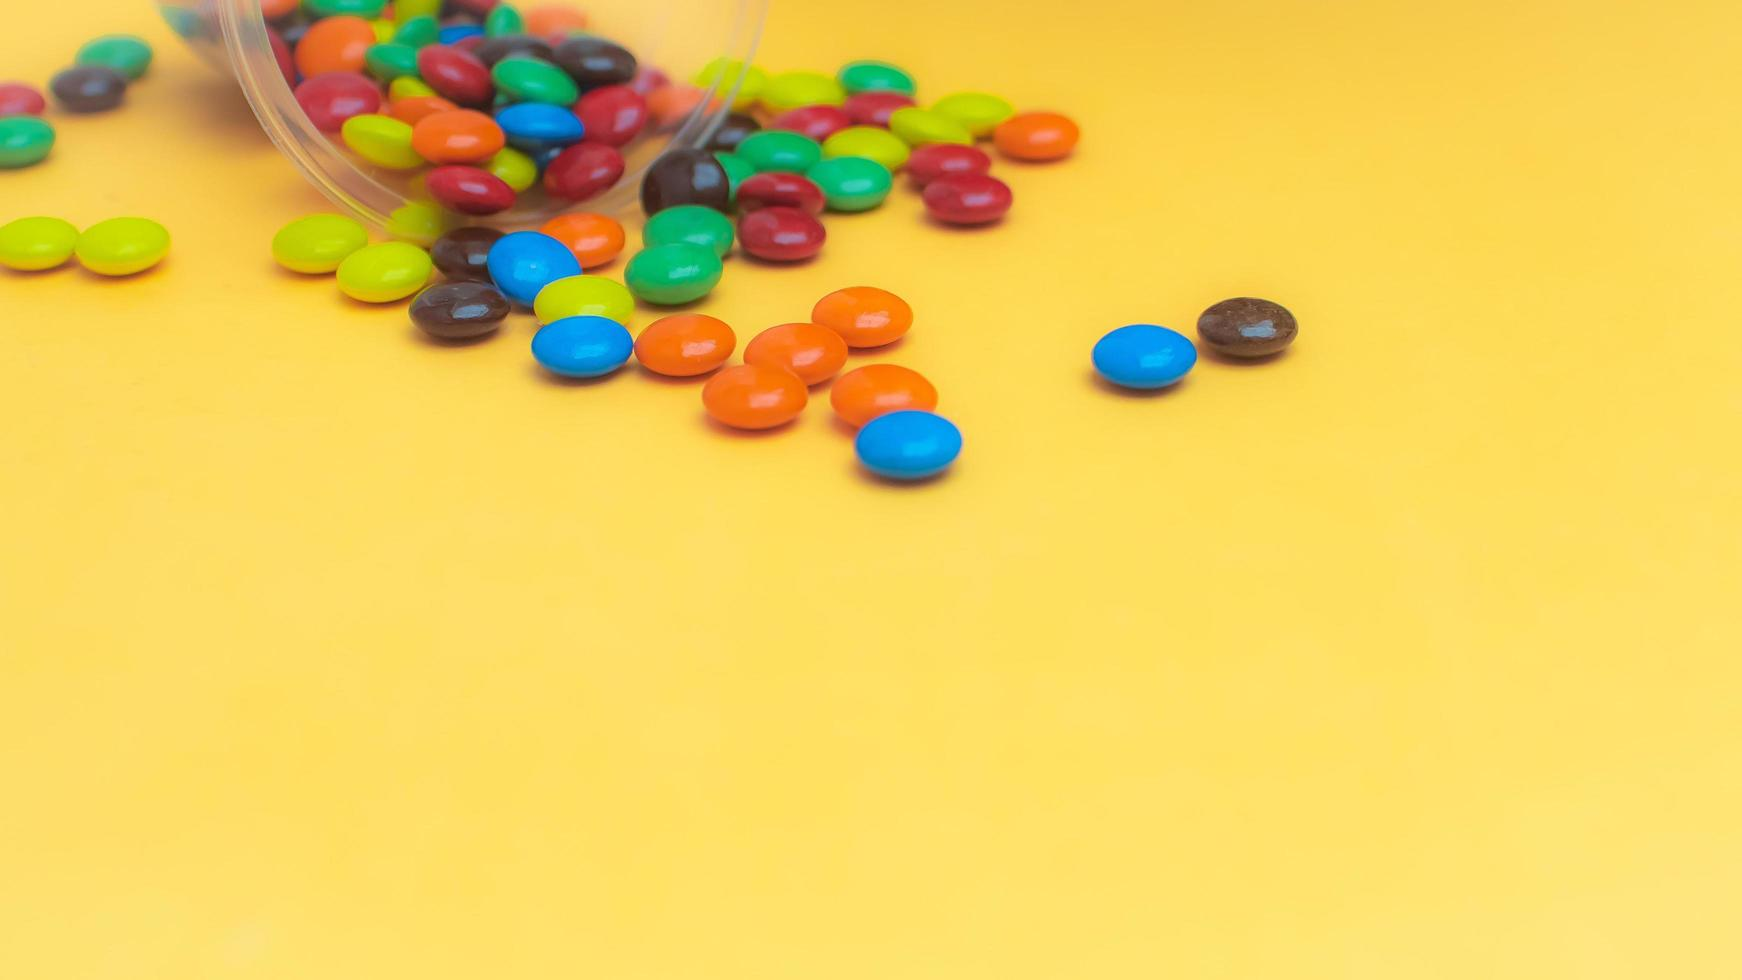 bonbons enrobés de chocolat photo